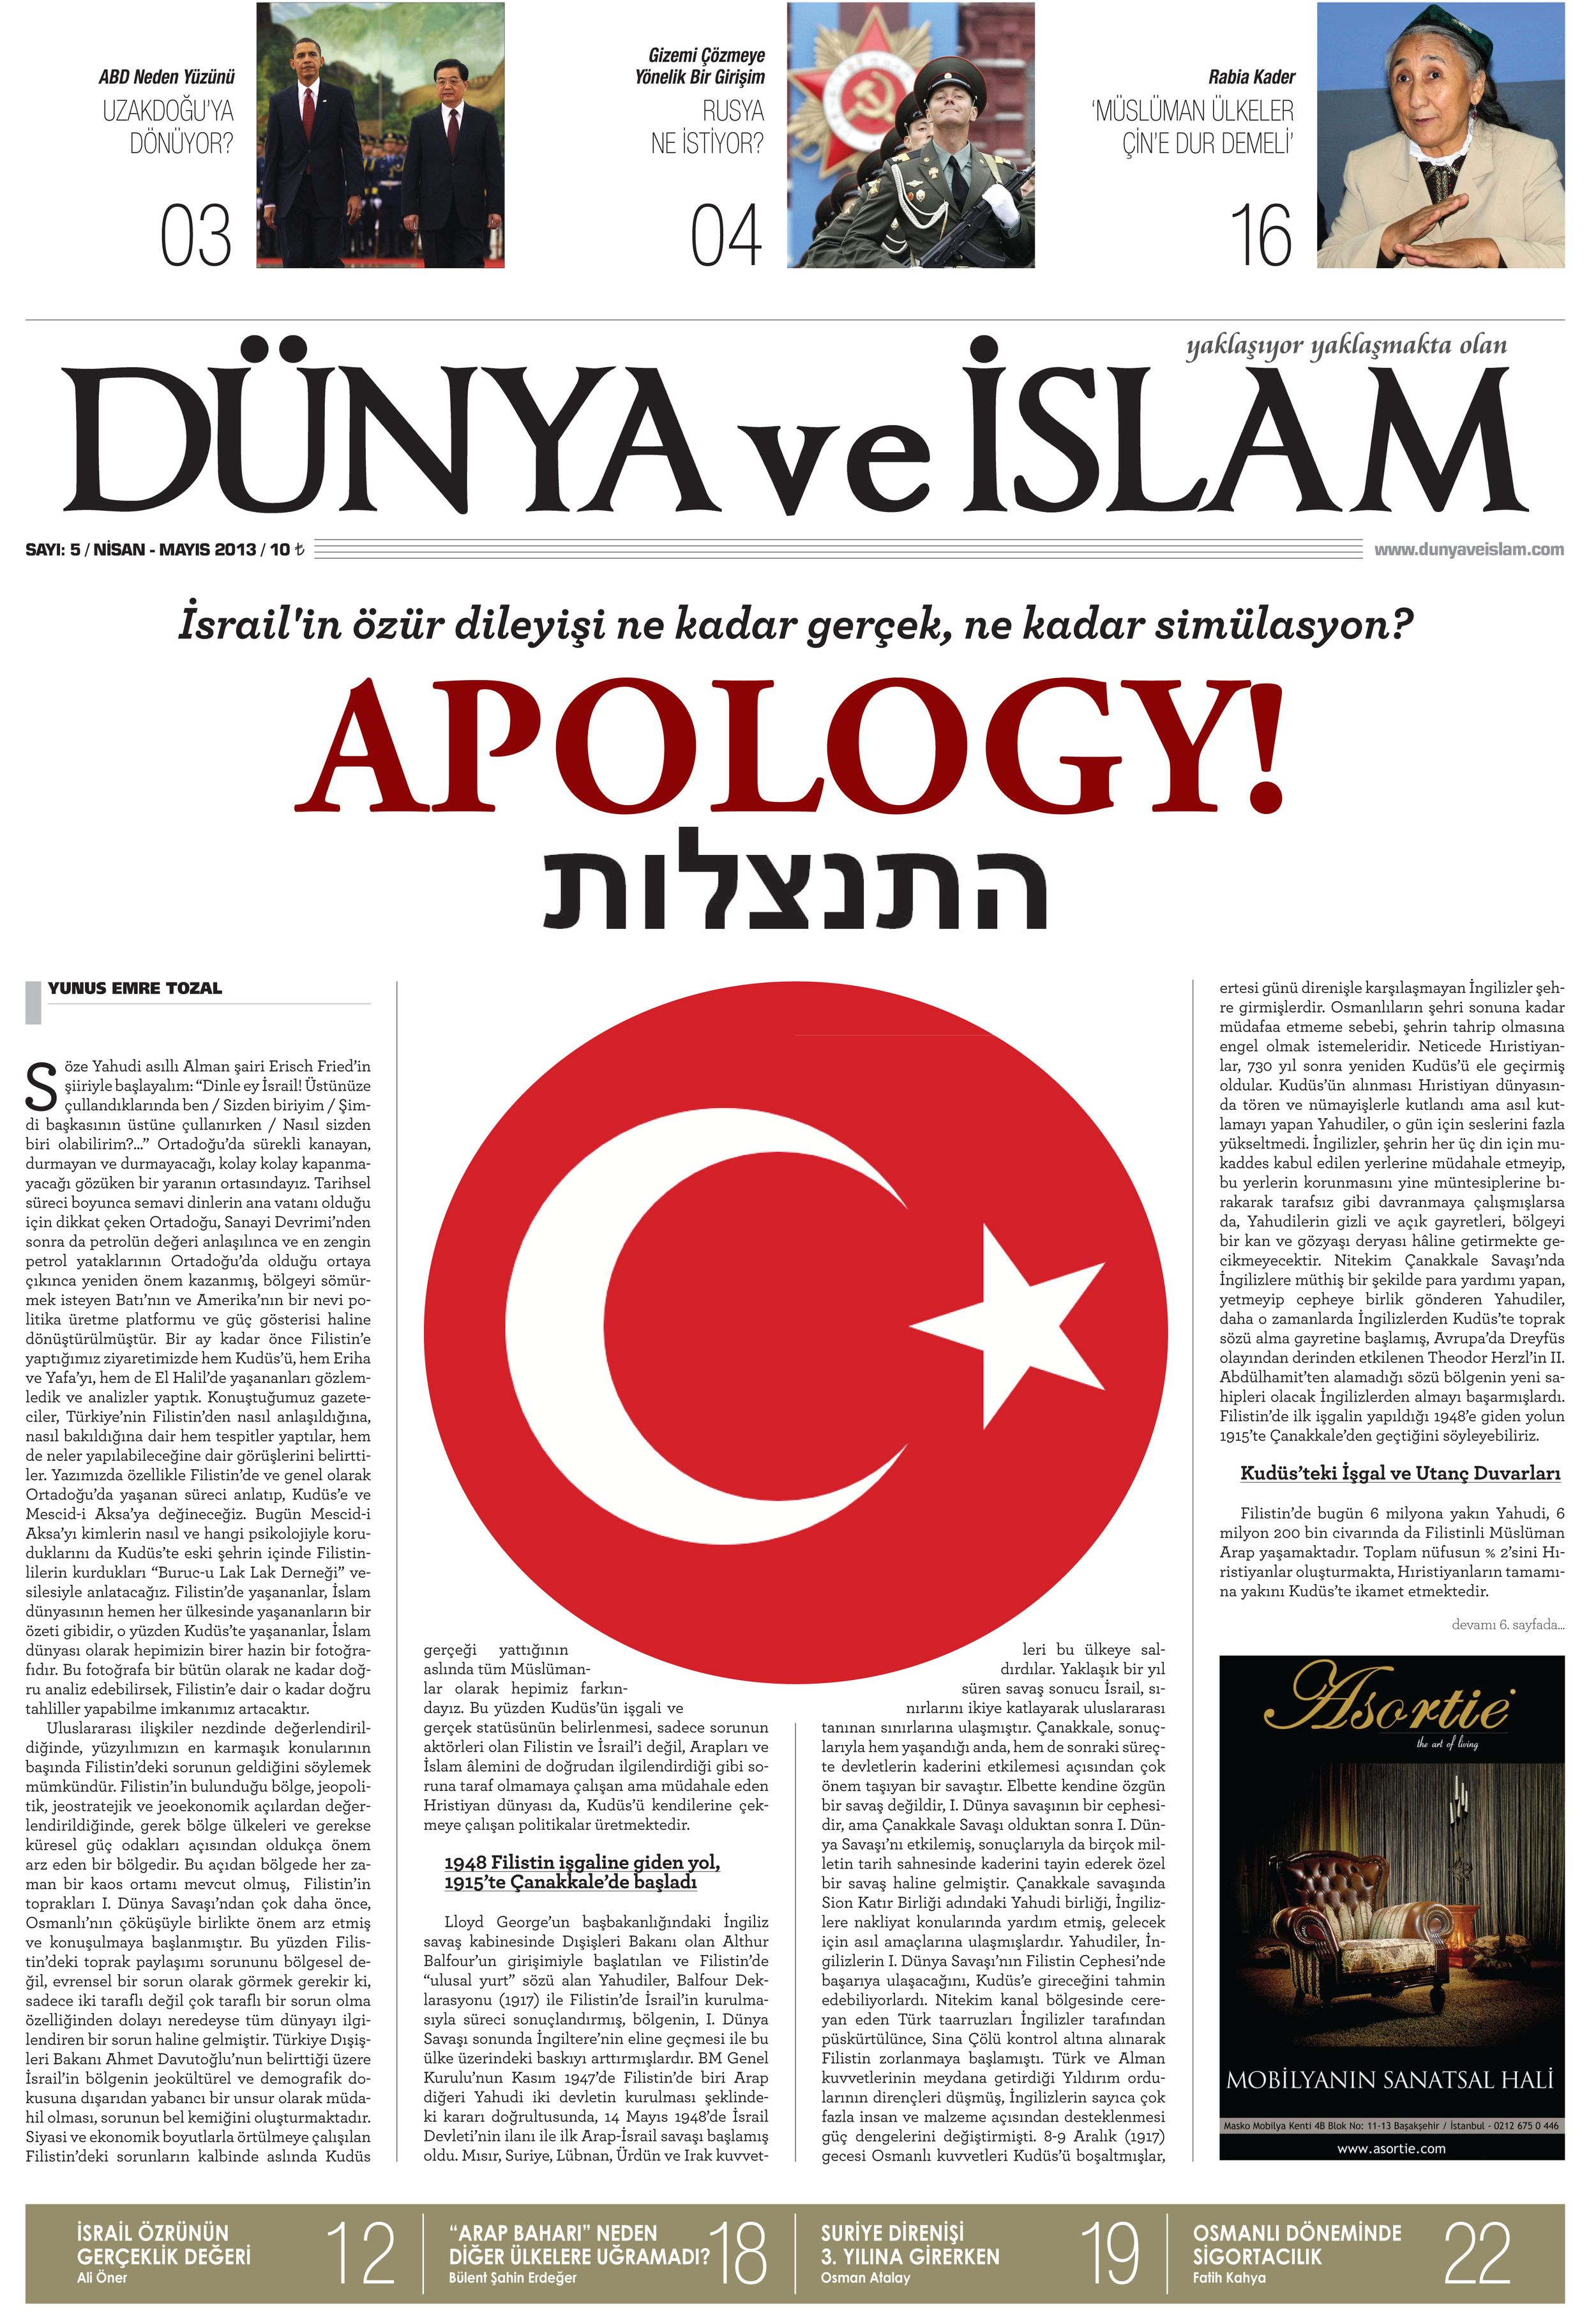 islamın dünya hakimiyeti bet-at-home euro 2016 bild 51635 // börse und sport oder sport